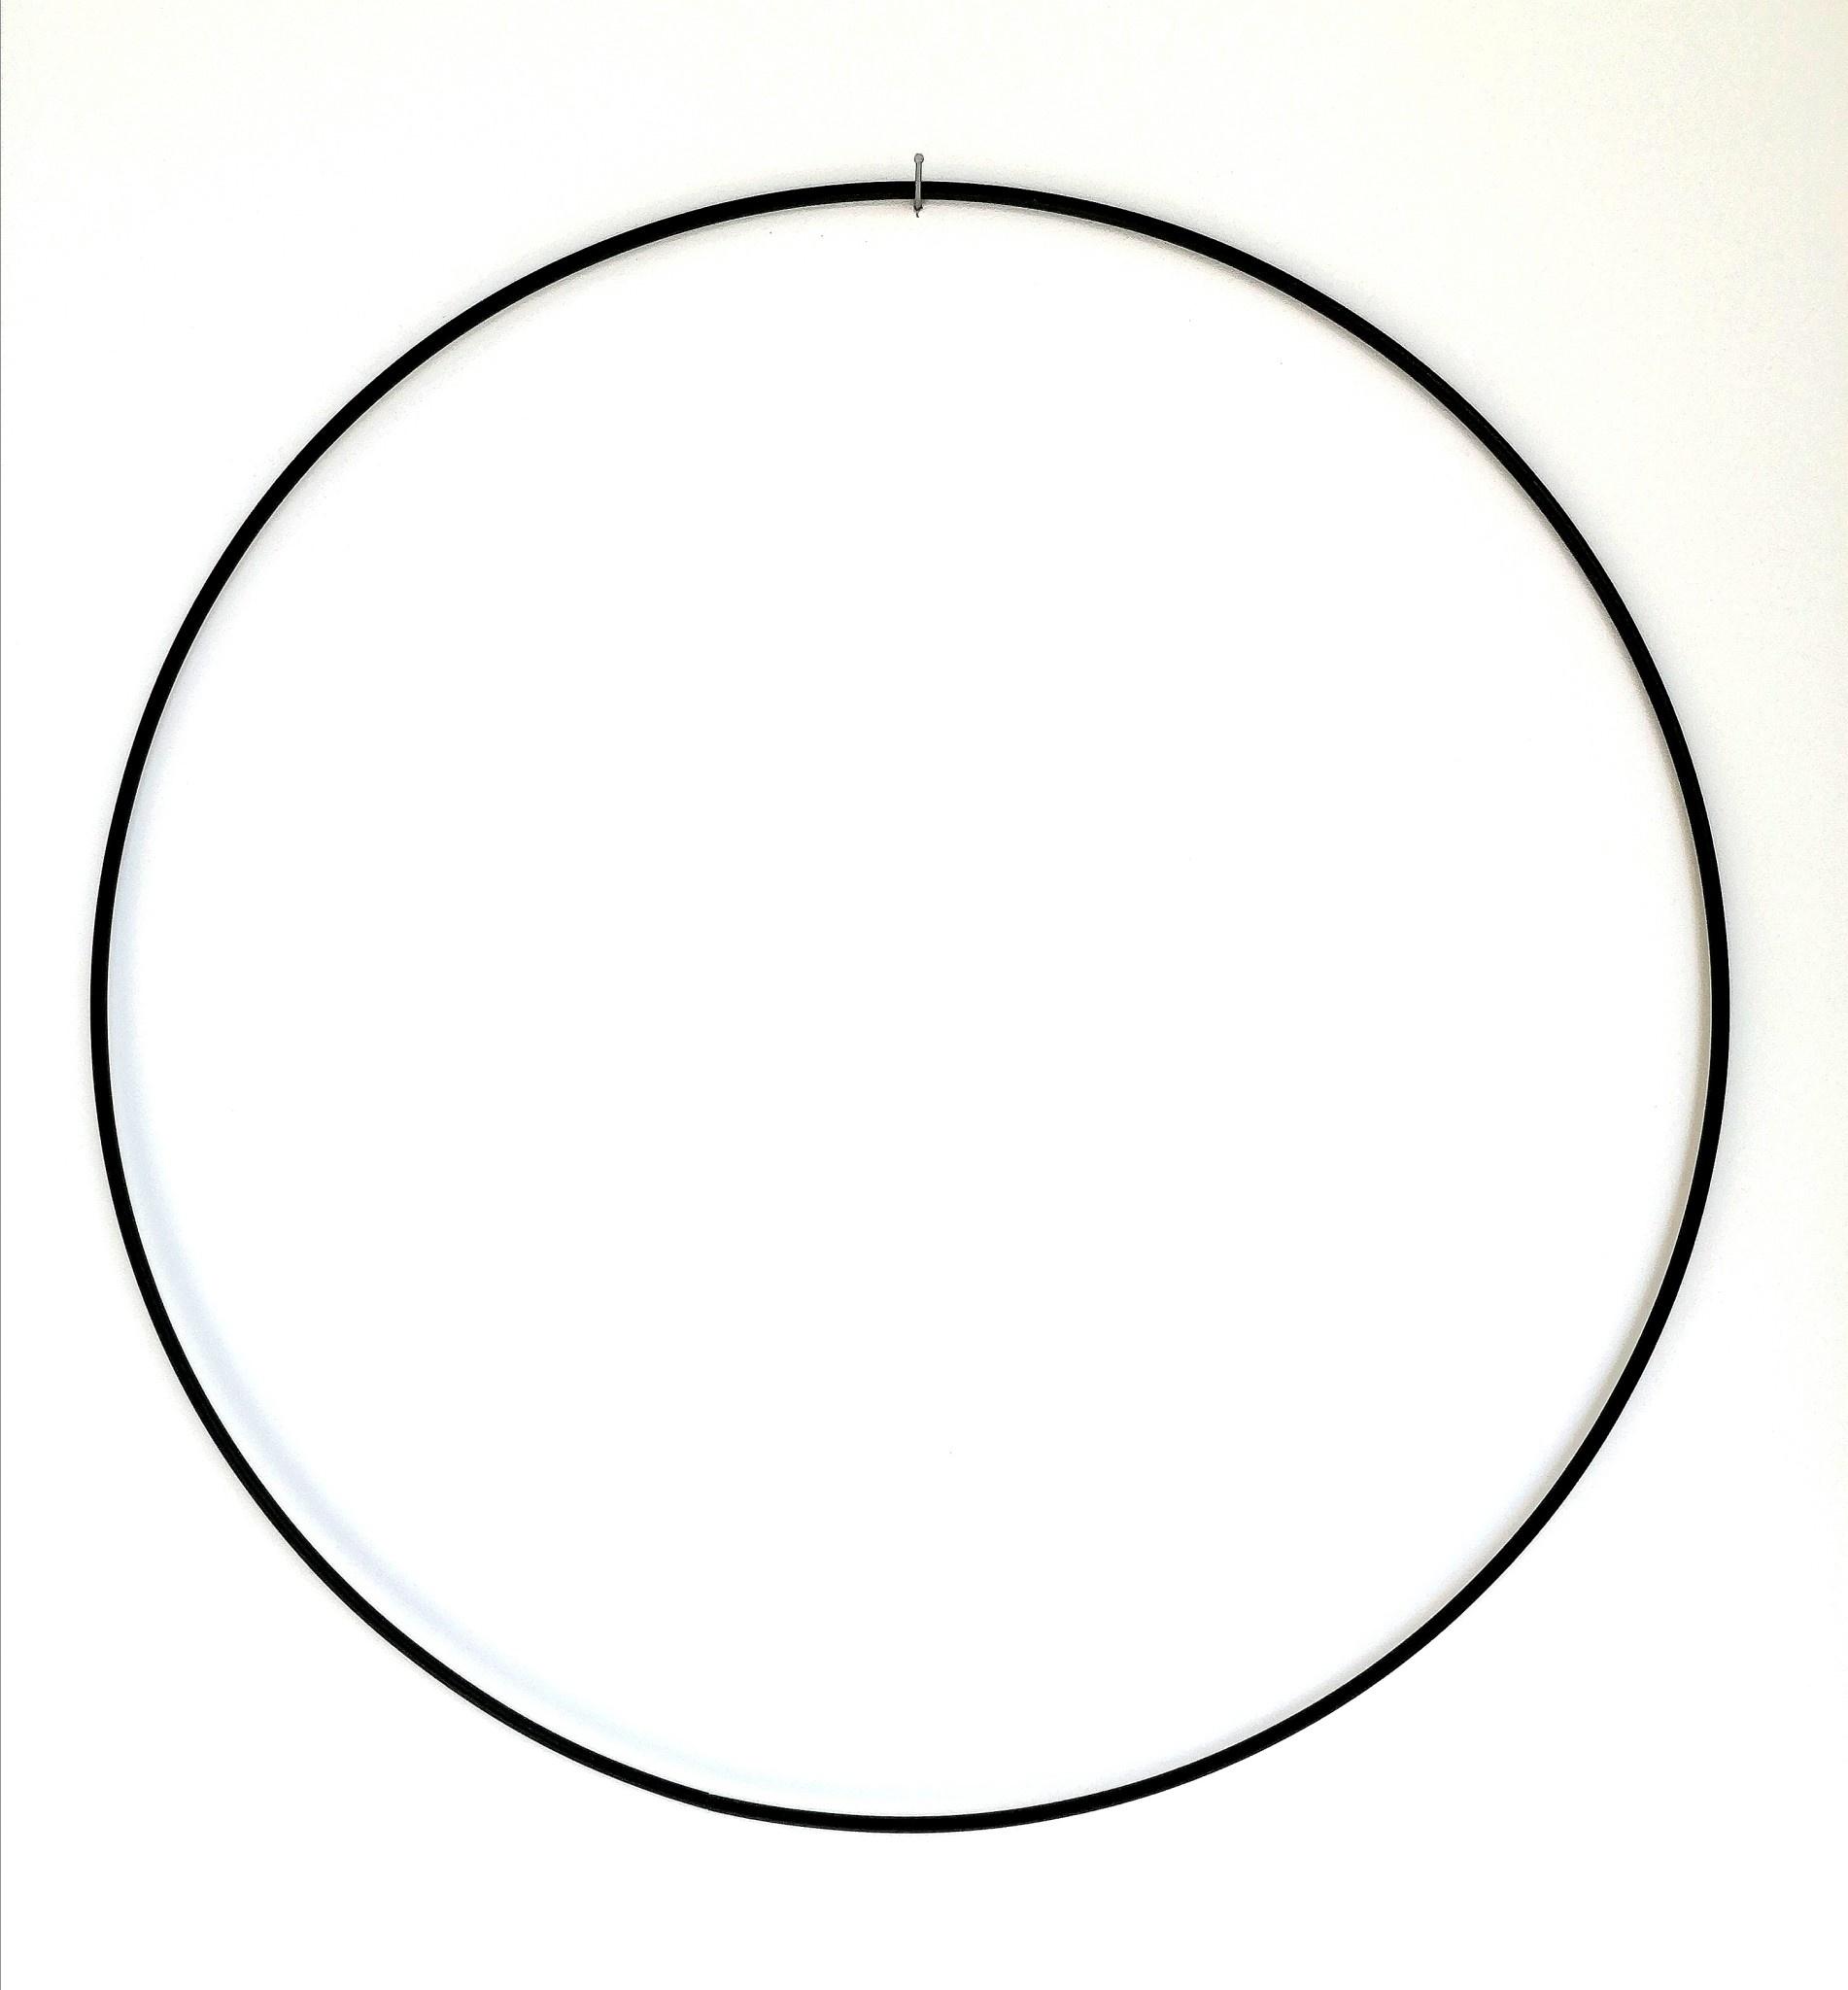 Hoepel Zwart - Large-1